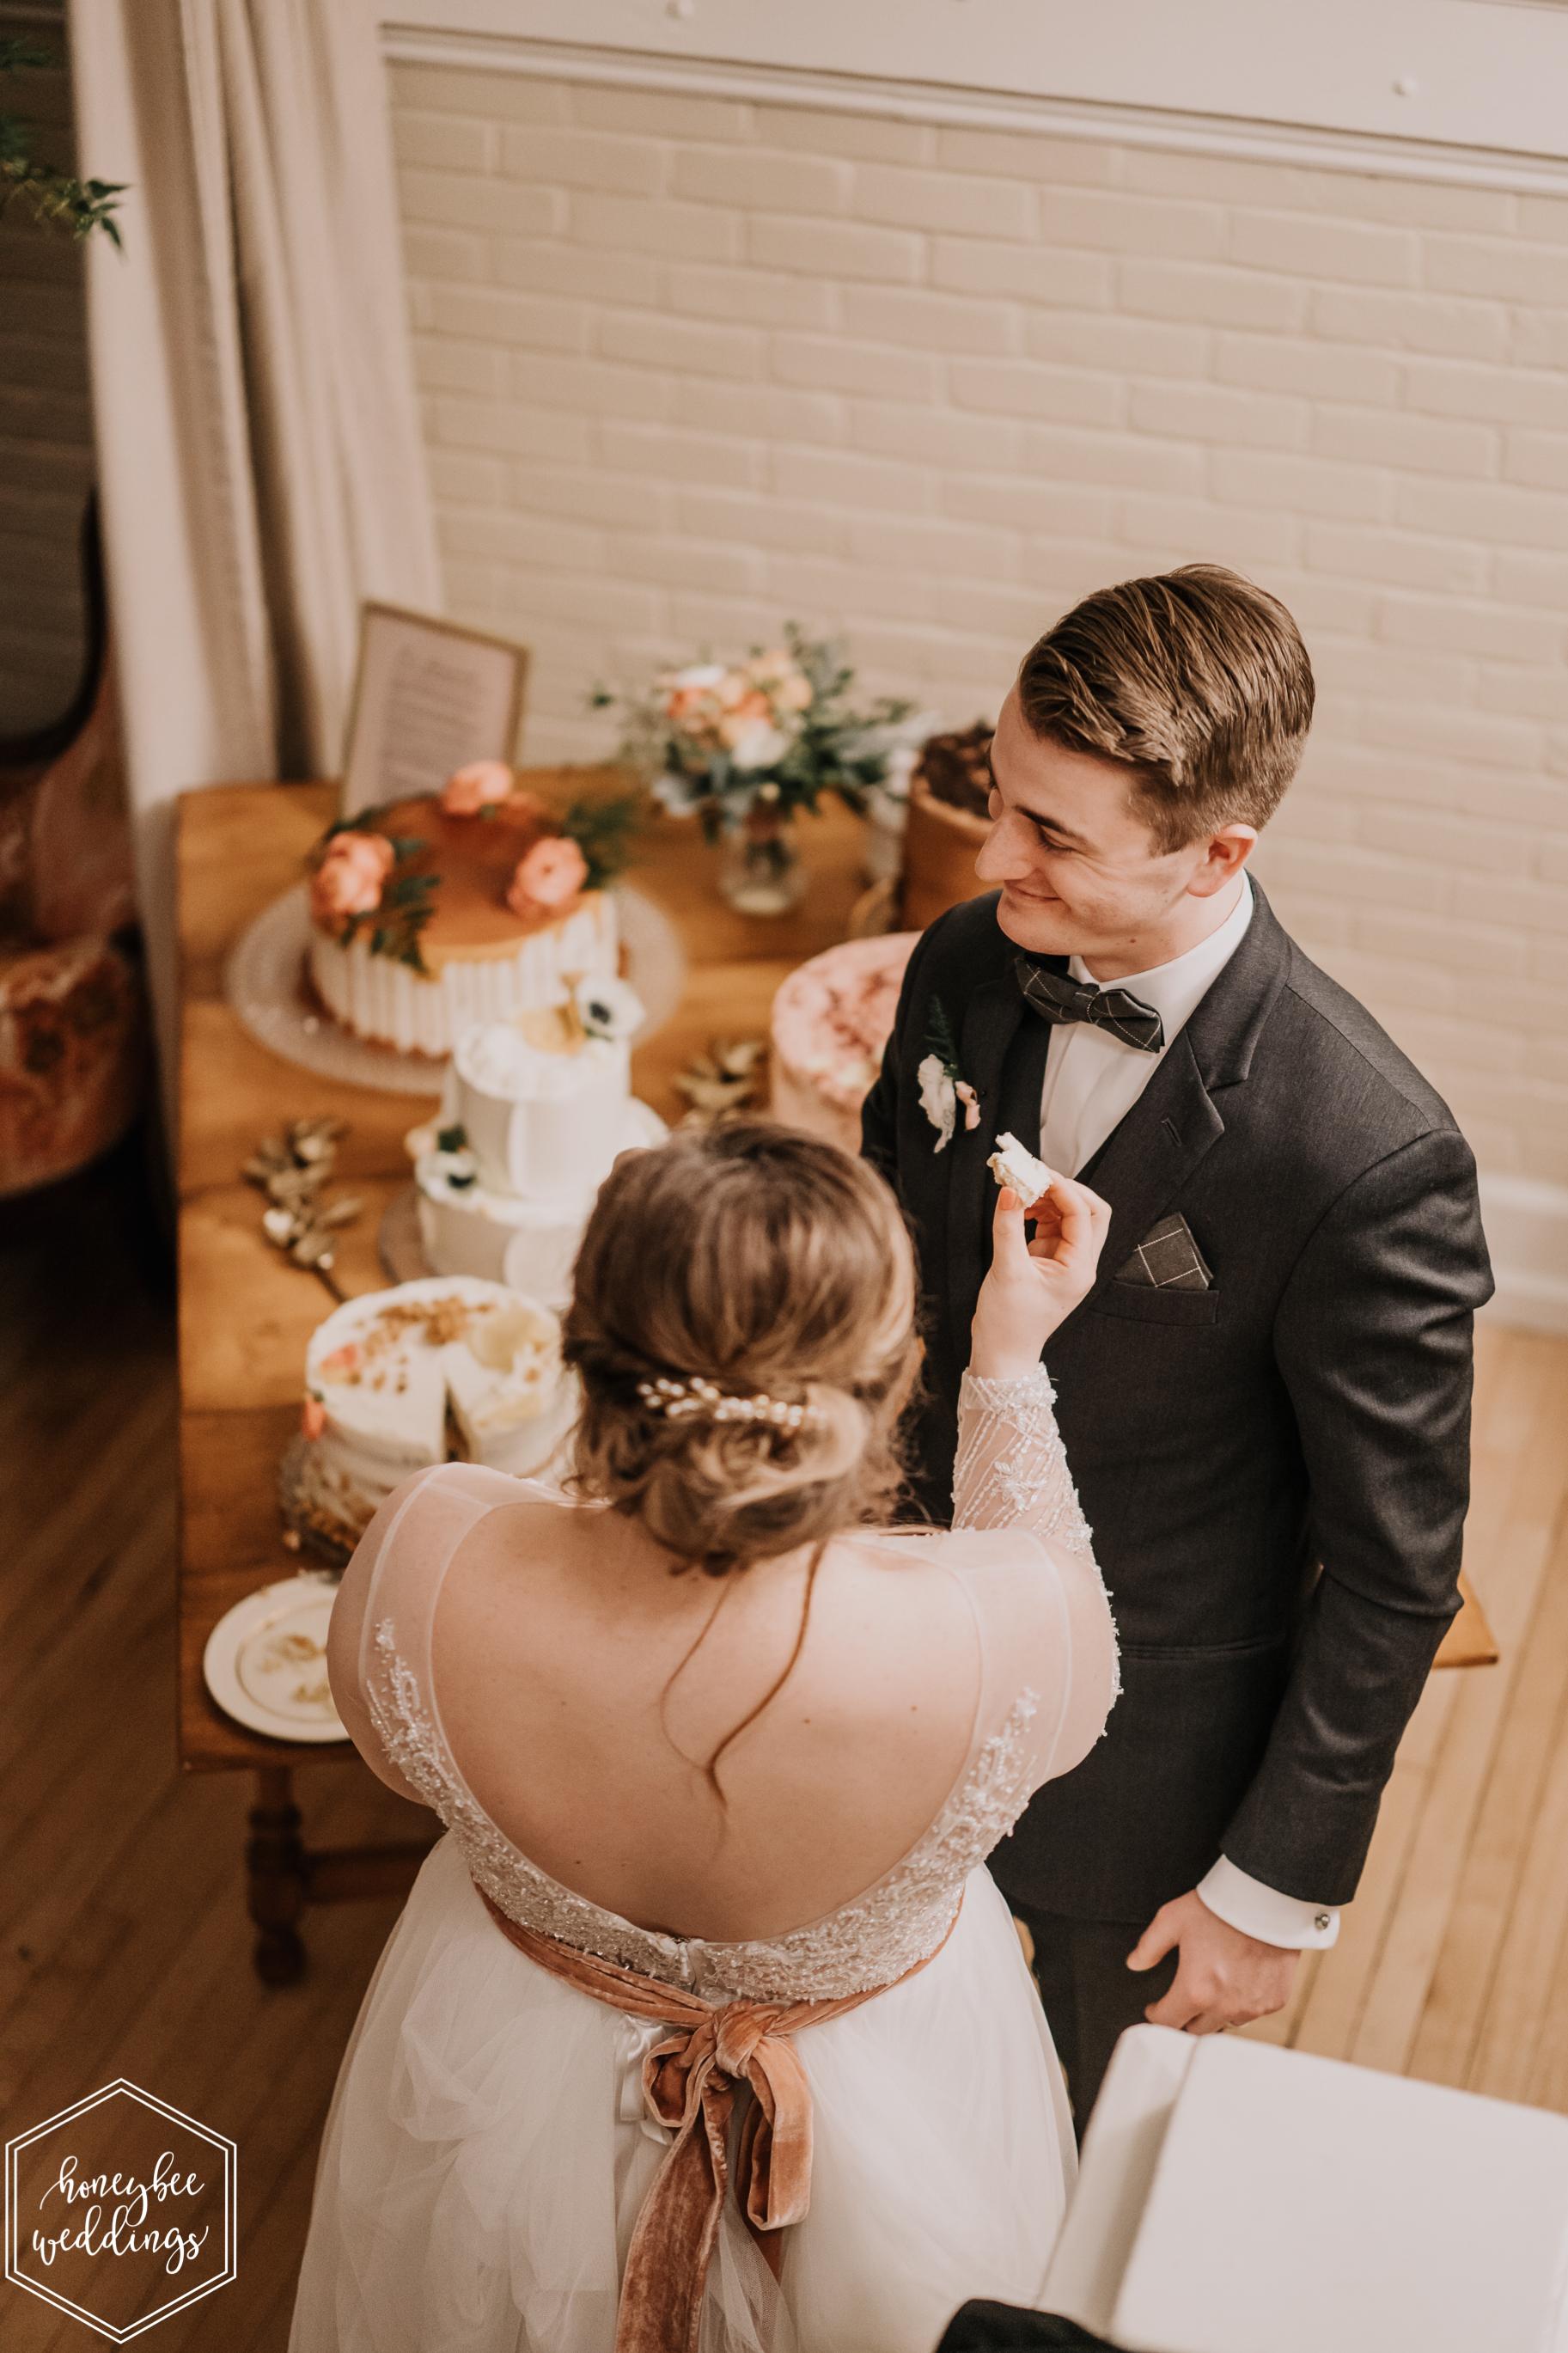 0292Montana Wedding Photographer_Montana winter wedding_Wedding at Fort Missoula_Meri & Carter_January 19, 2019-258.jpg